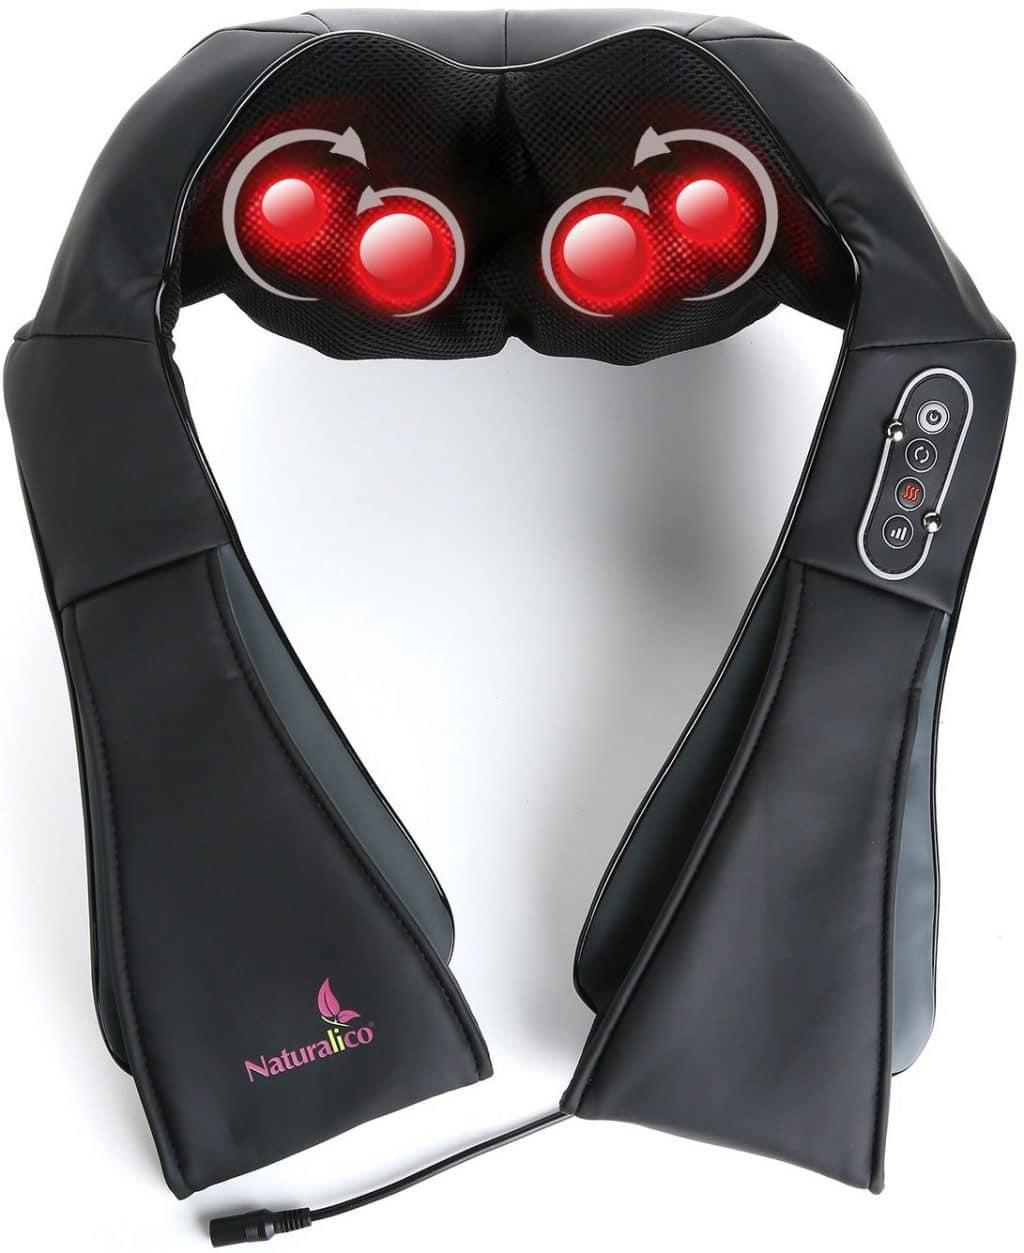 Naturalico® Shiatsu Massager With Heat